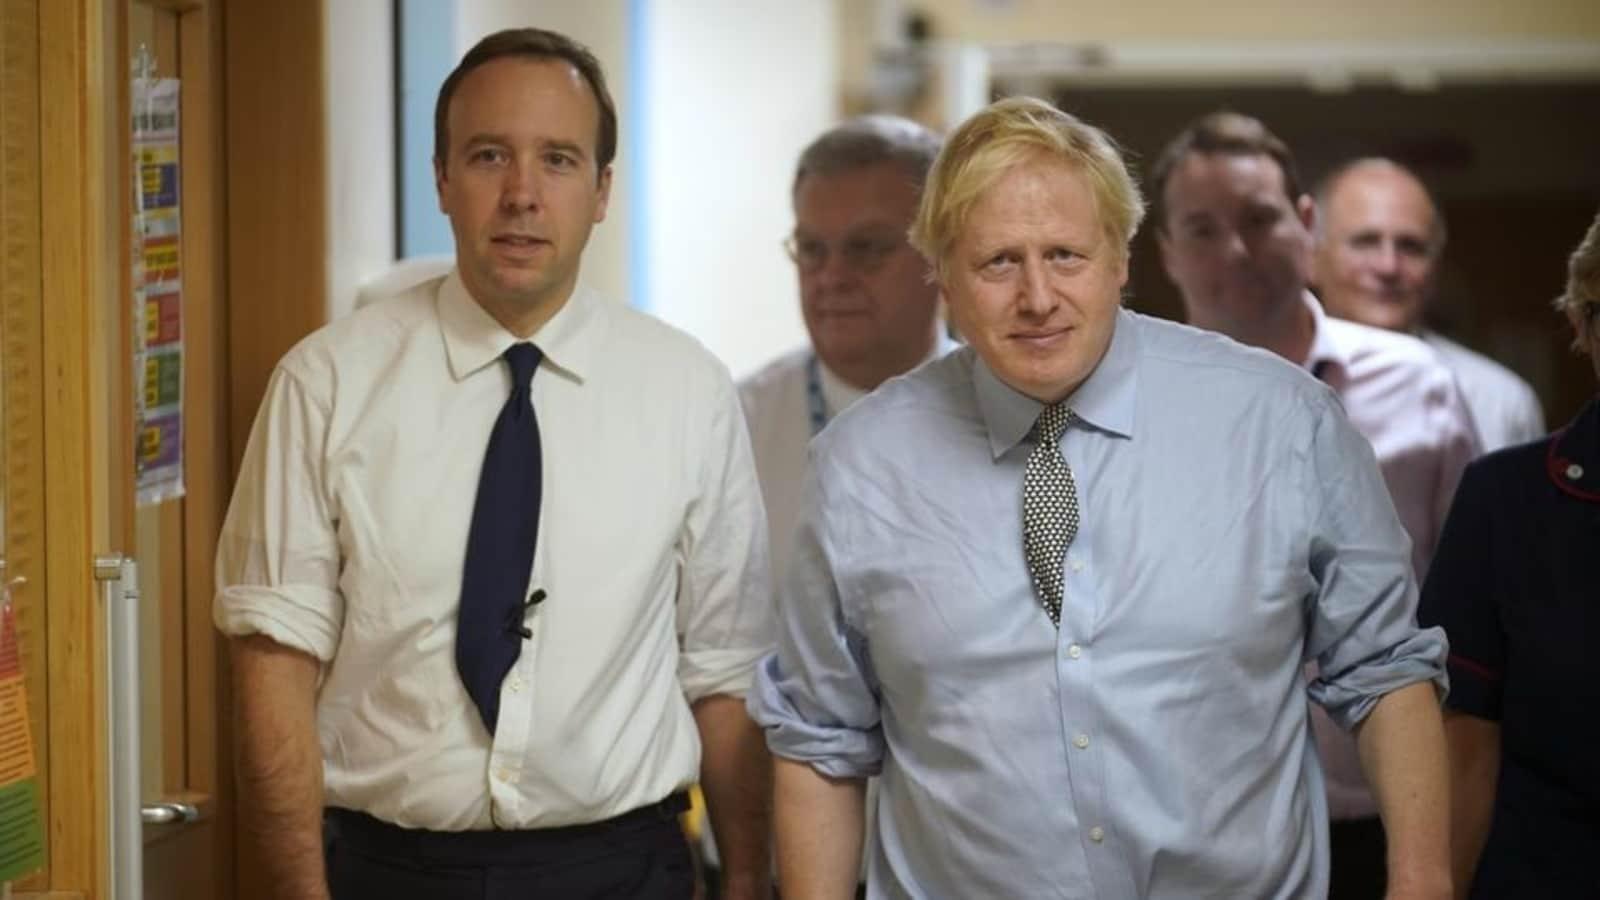 Totally hopeless': Boris Johnson lambasted his health minister, ex-adviser says | World News - Hindustan Times